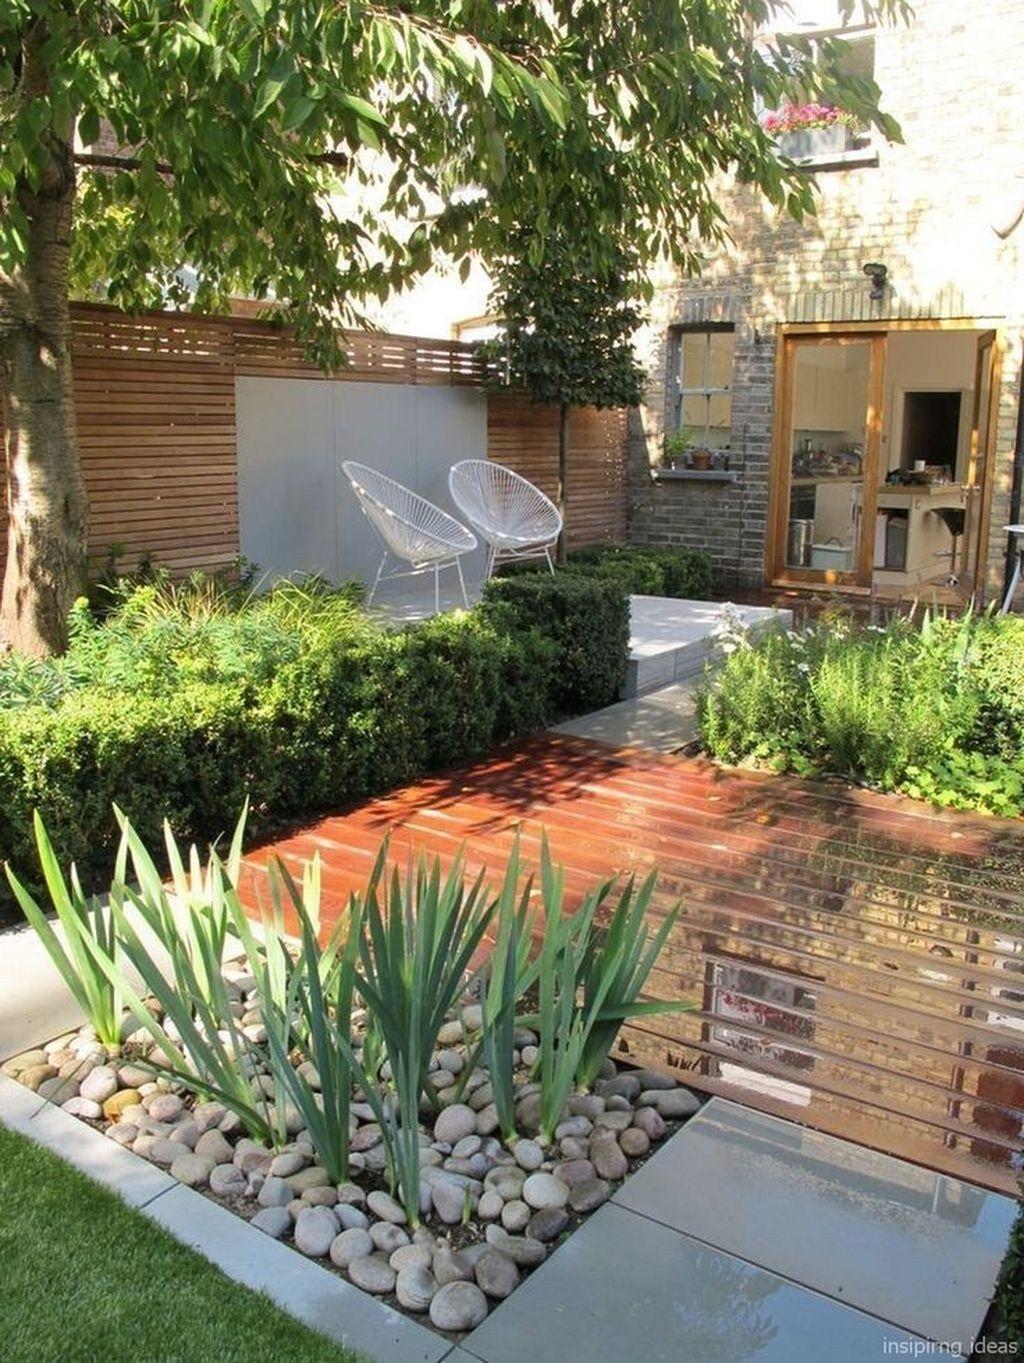 50 Awesome Modern Garden Architecture Design Ideas Pimphomee Backyard Landscaping Backyard Landscaping Designs Garden Ideas Australia Modern backyard ideas australia